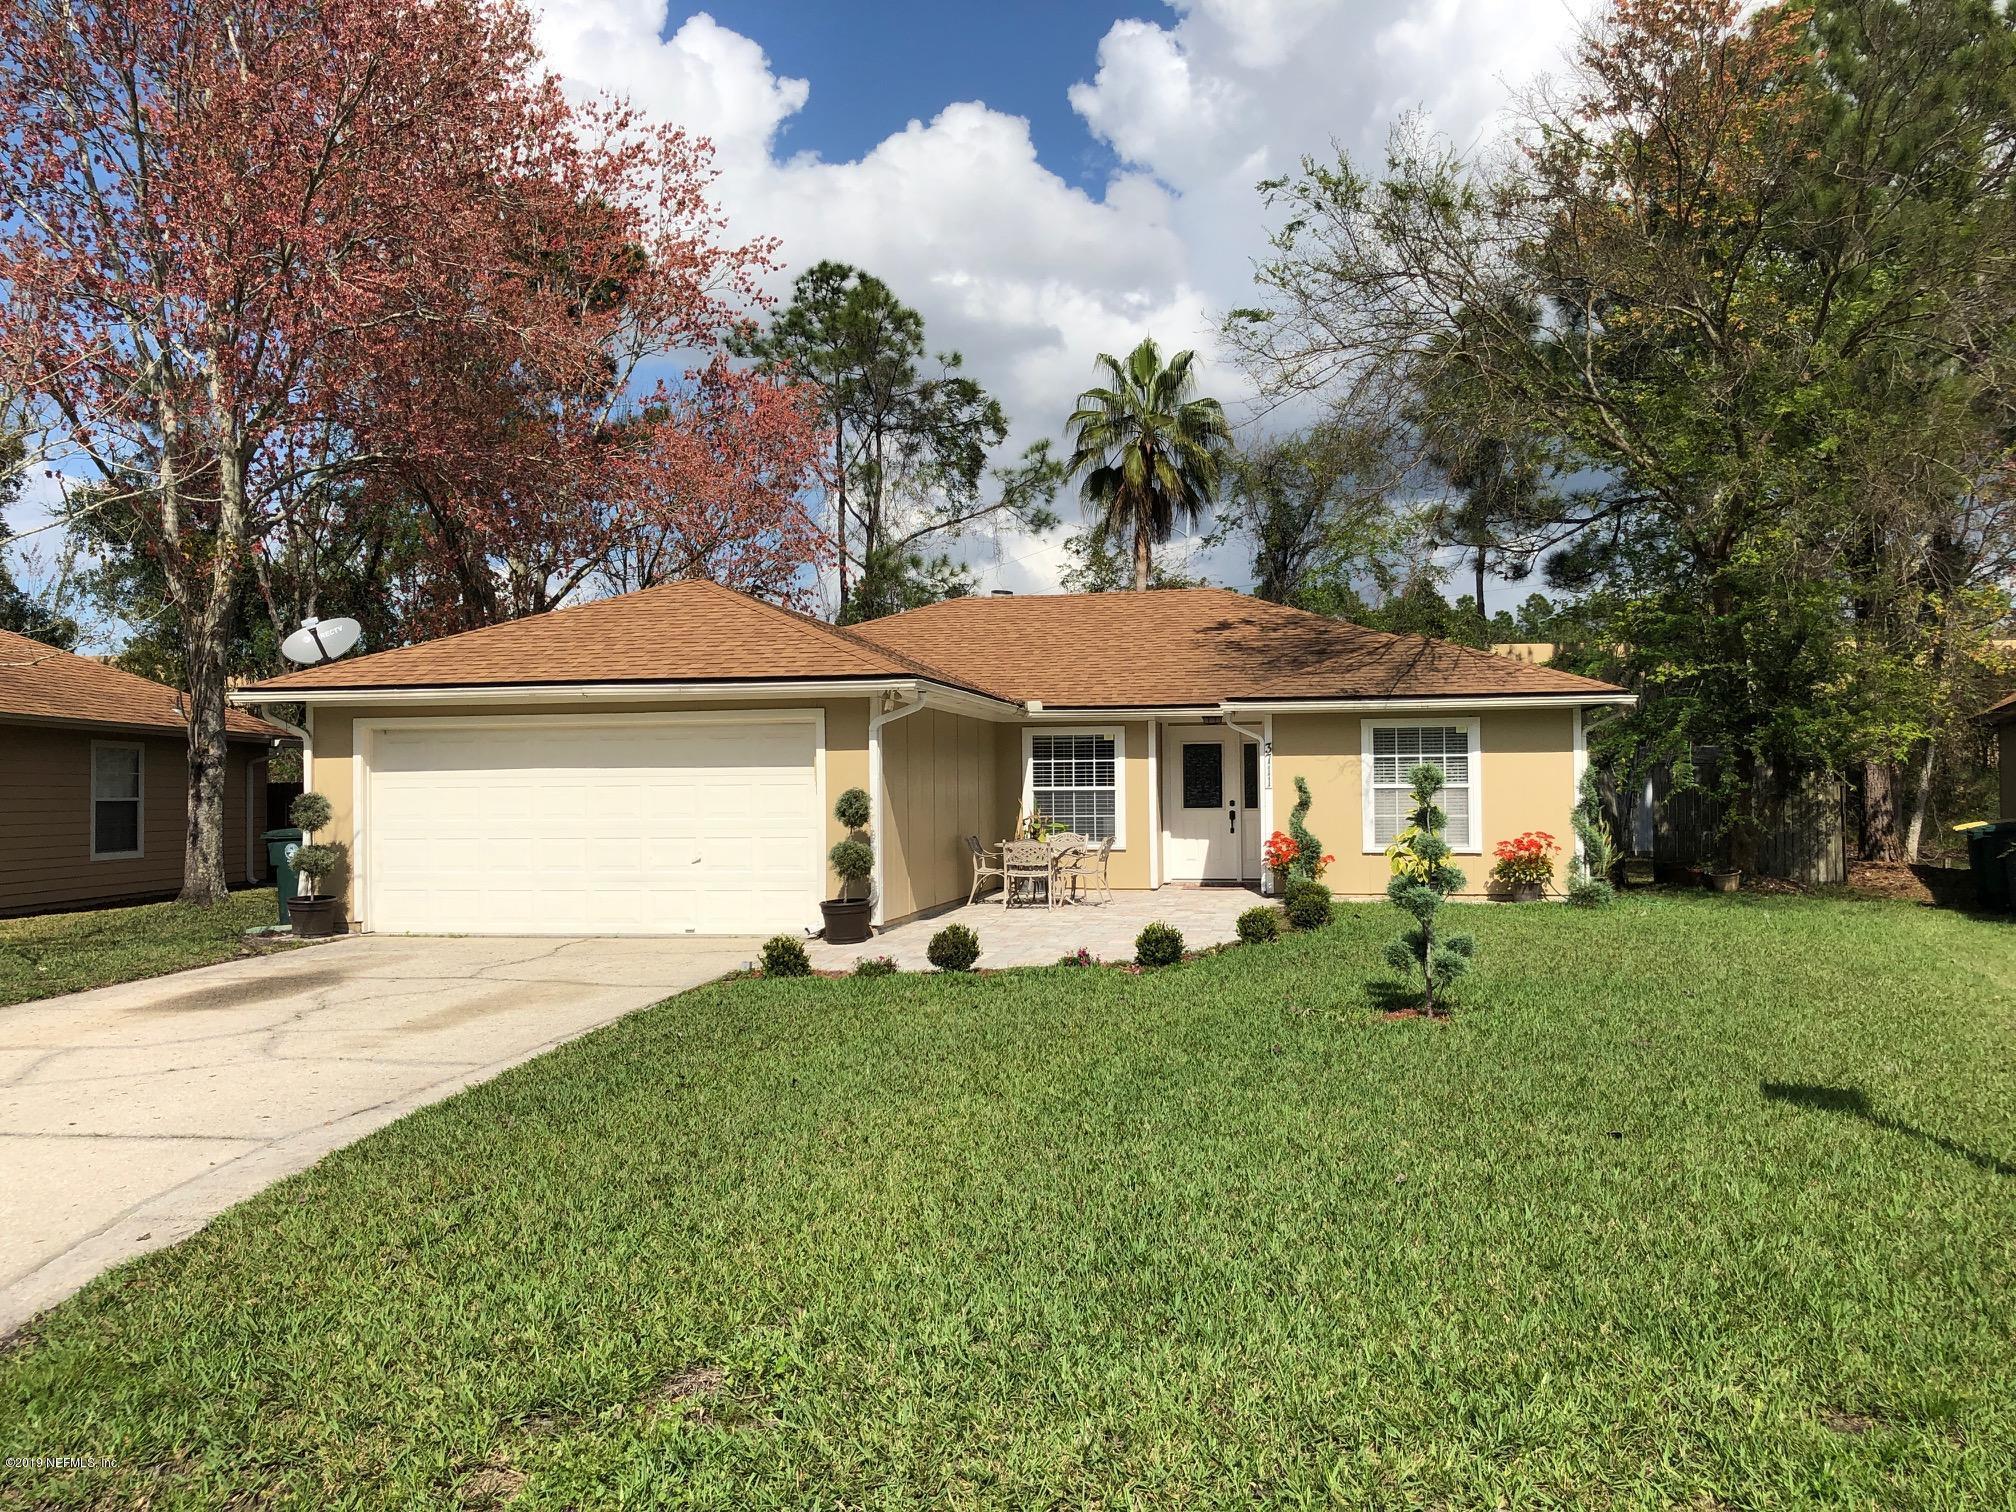 Photo of 3711 CAROL ANN, JACKSONVILLE, FL 32223